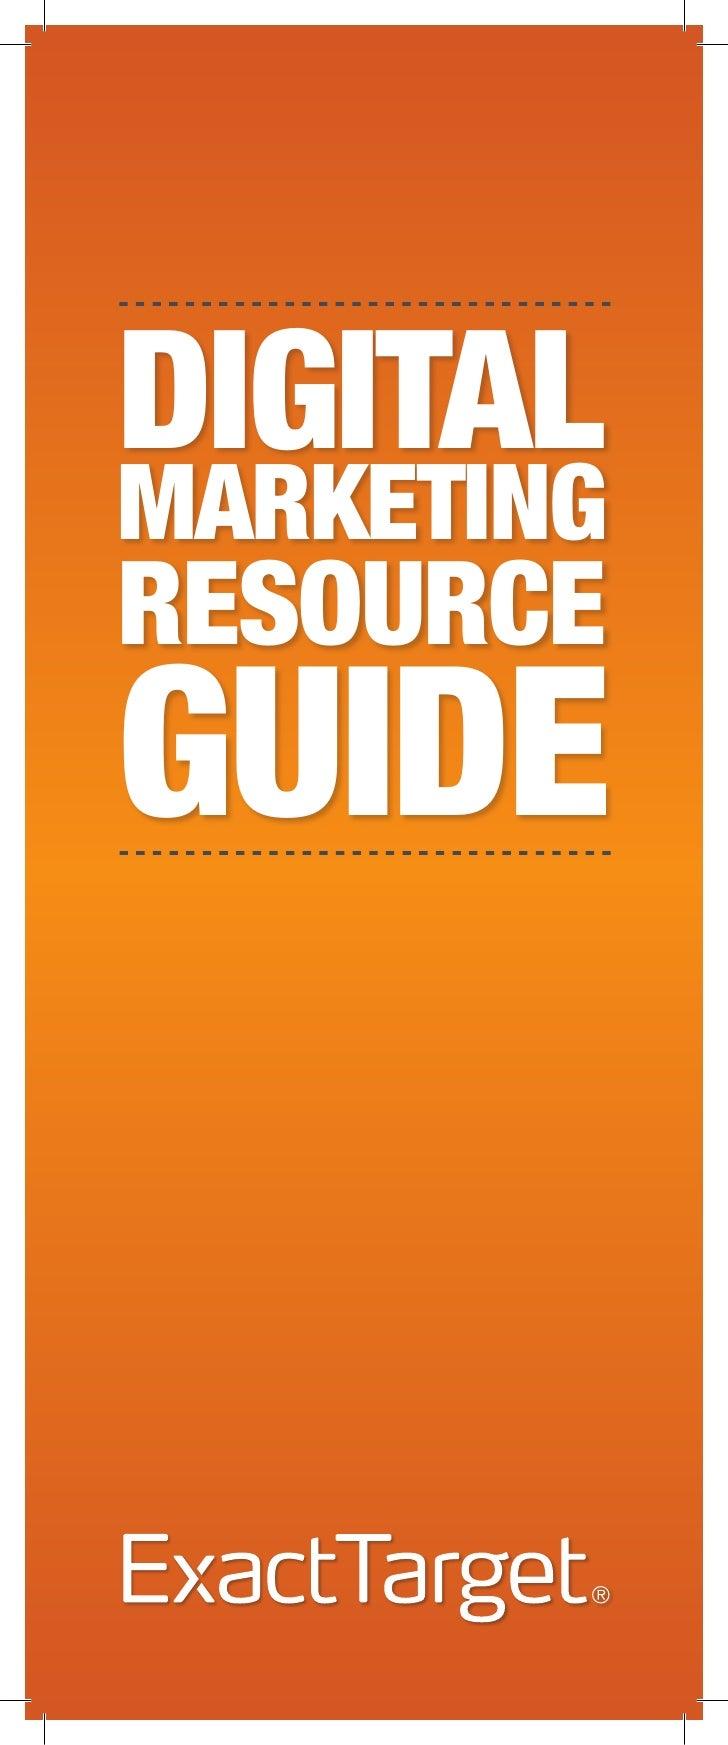 DIGITAL MARKETING RESOURCE GUIDE    DIGITAL  MARKETING  RESOURCE  GUIDE